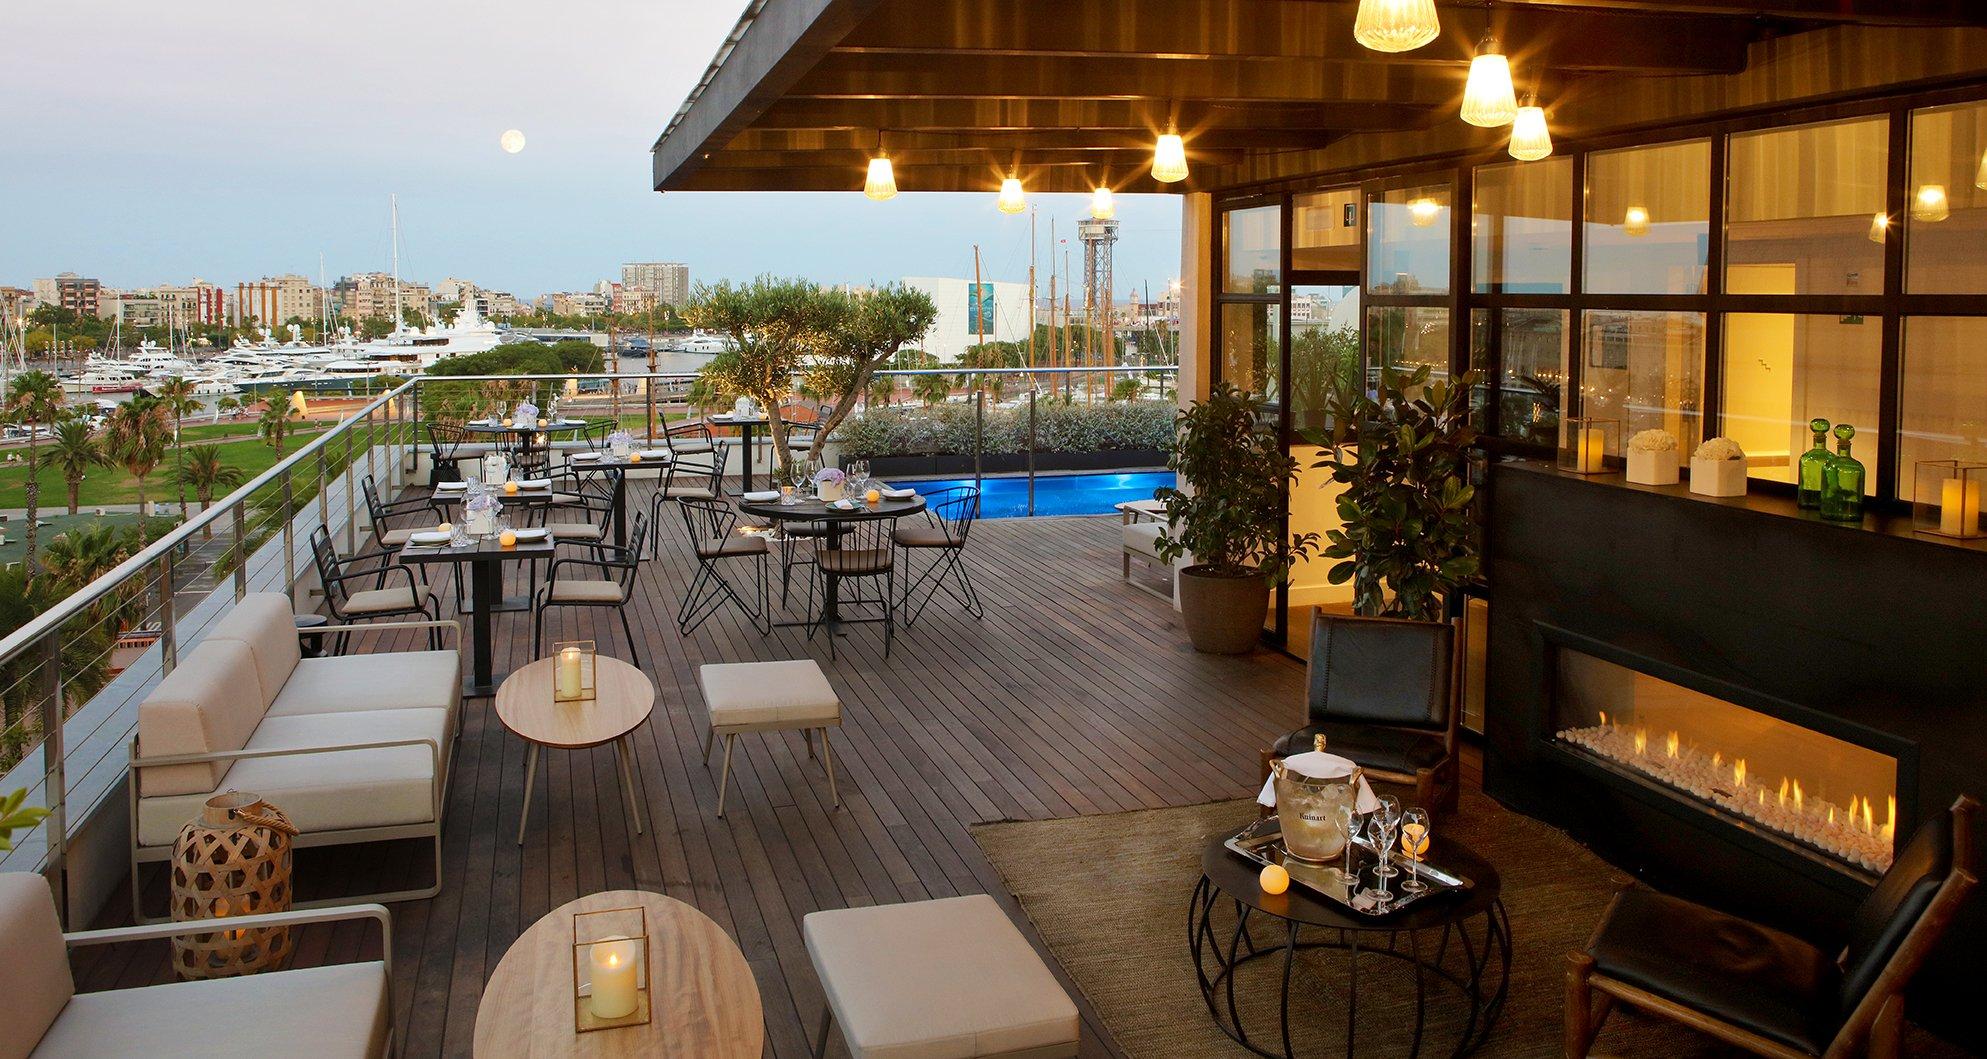 Средняя цена номера в испанских отелях выросла за год на 5,6%